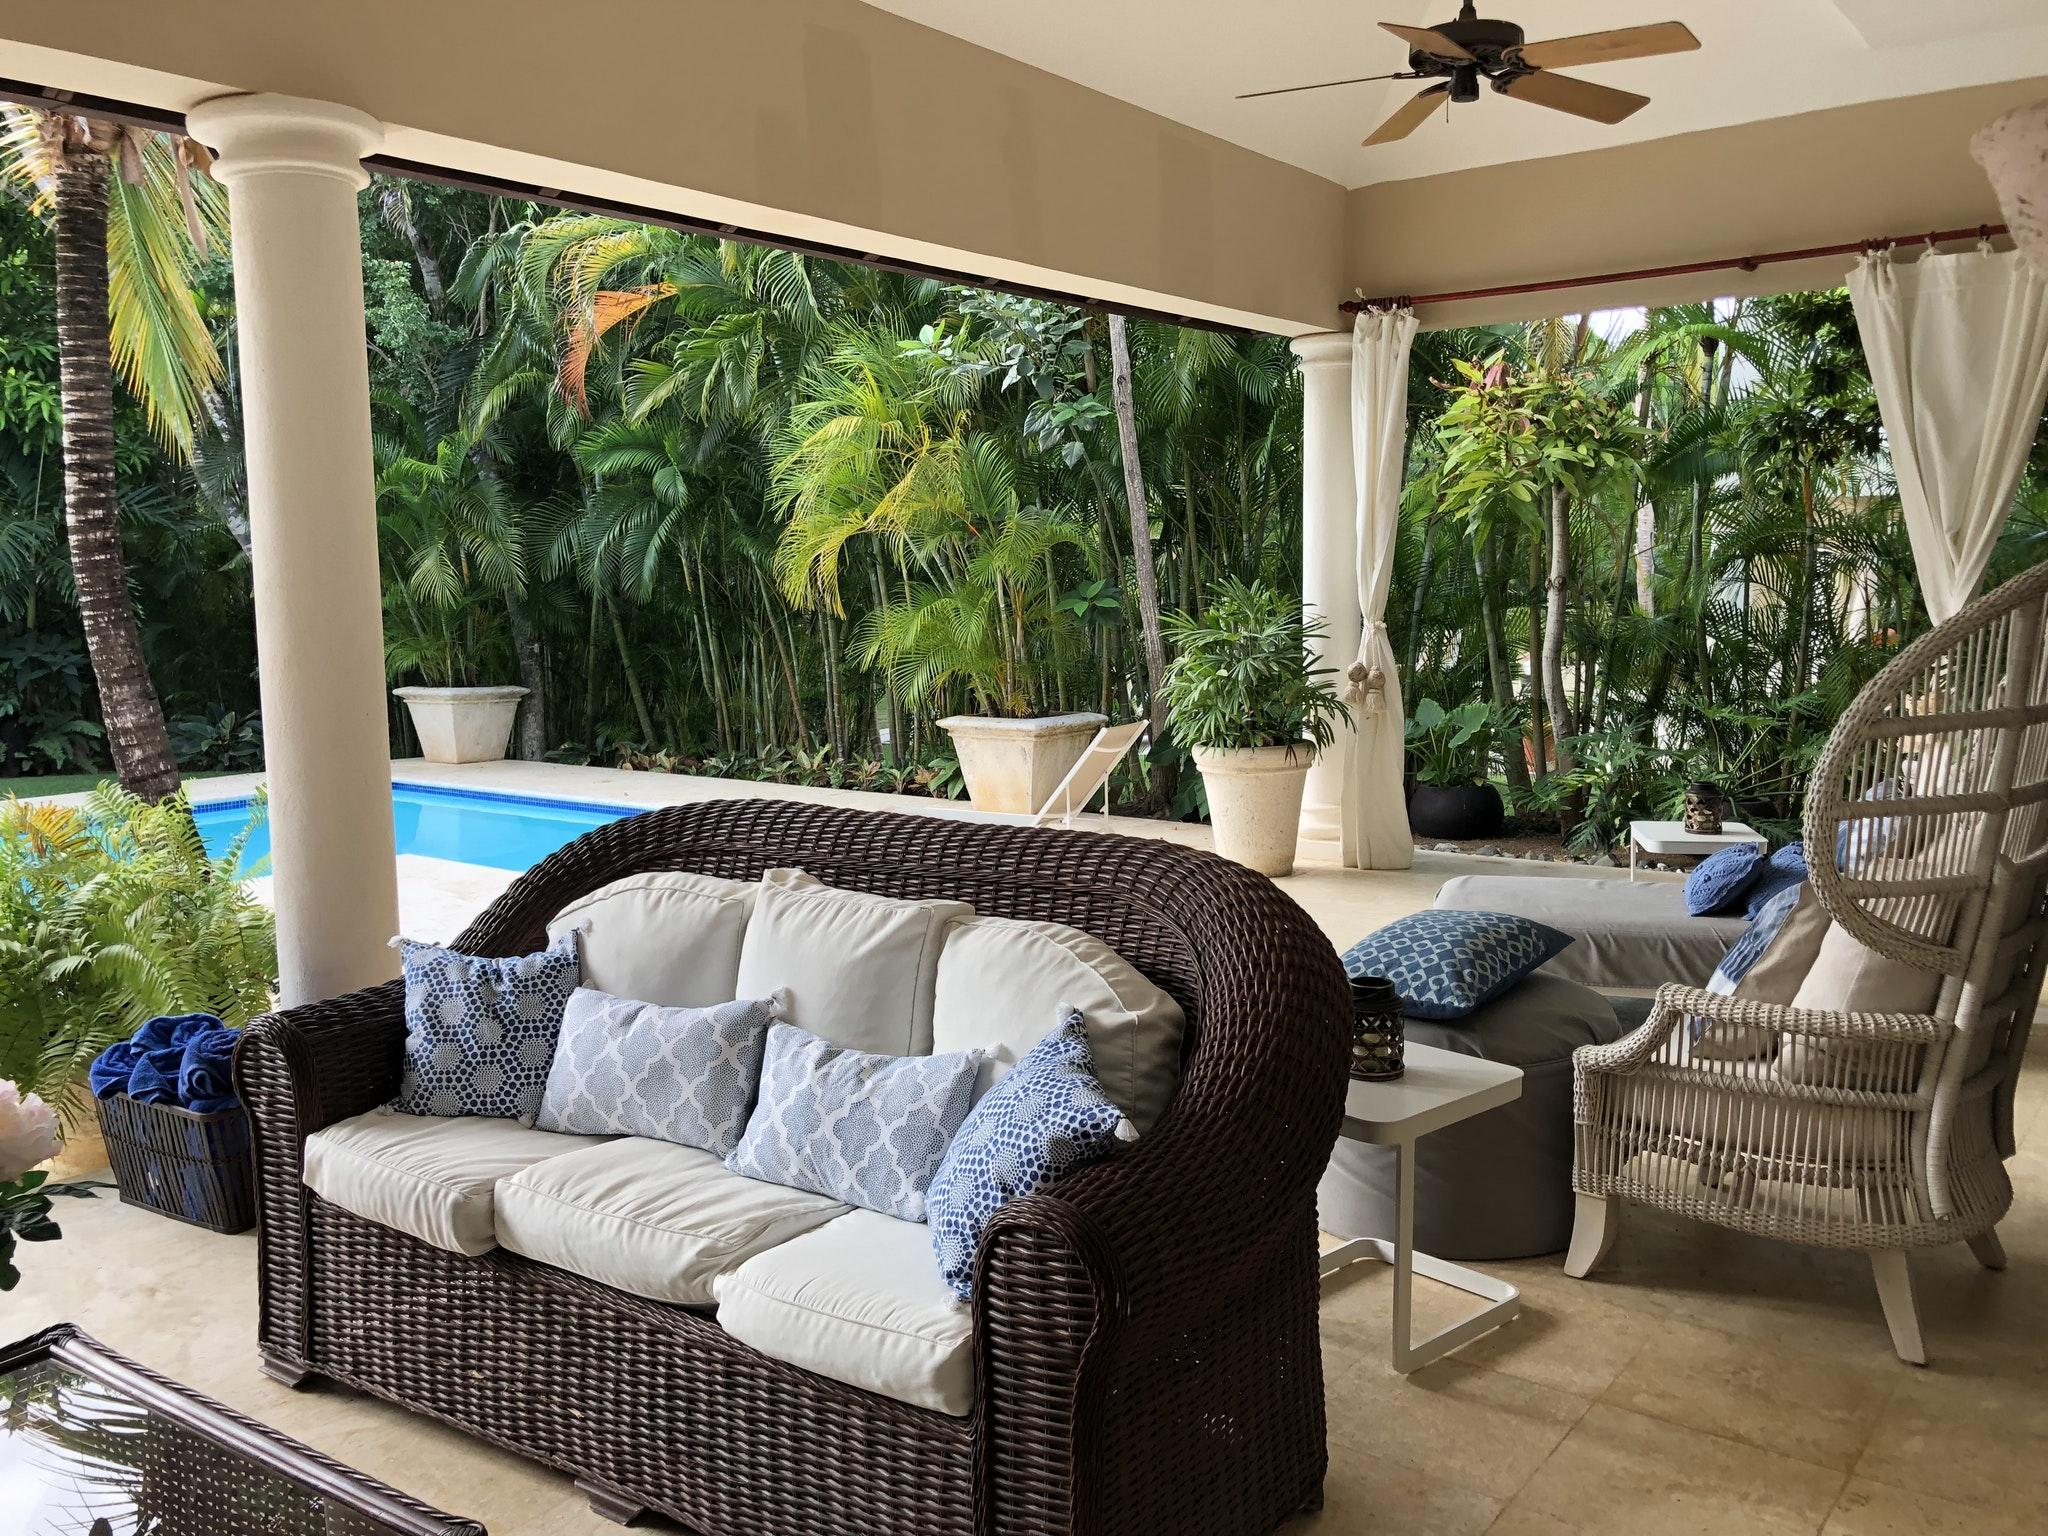 Ferienhaus Punta Cana, 6 Personen, Dominikanische Republik, Ostküste ...